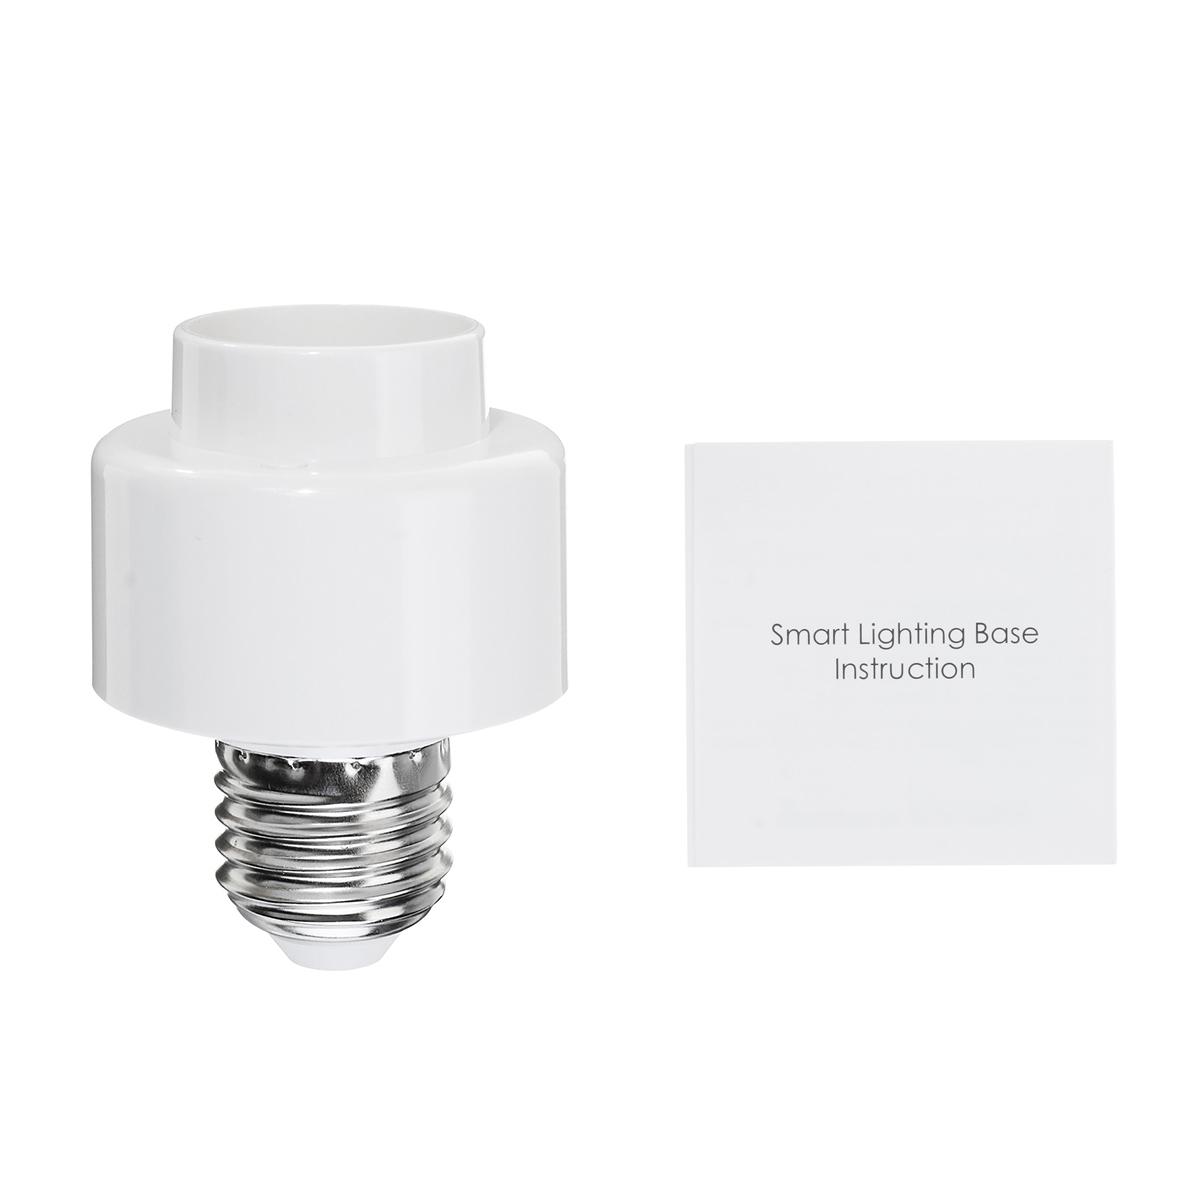 AC100-250V E27 Smart WiFi Light Разъем Конвертер лампочек работает с Alexa Google Home